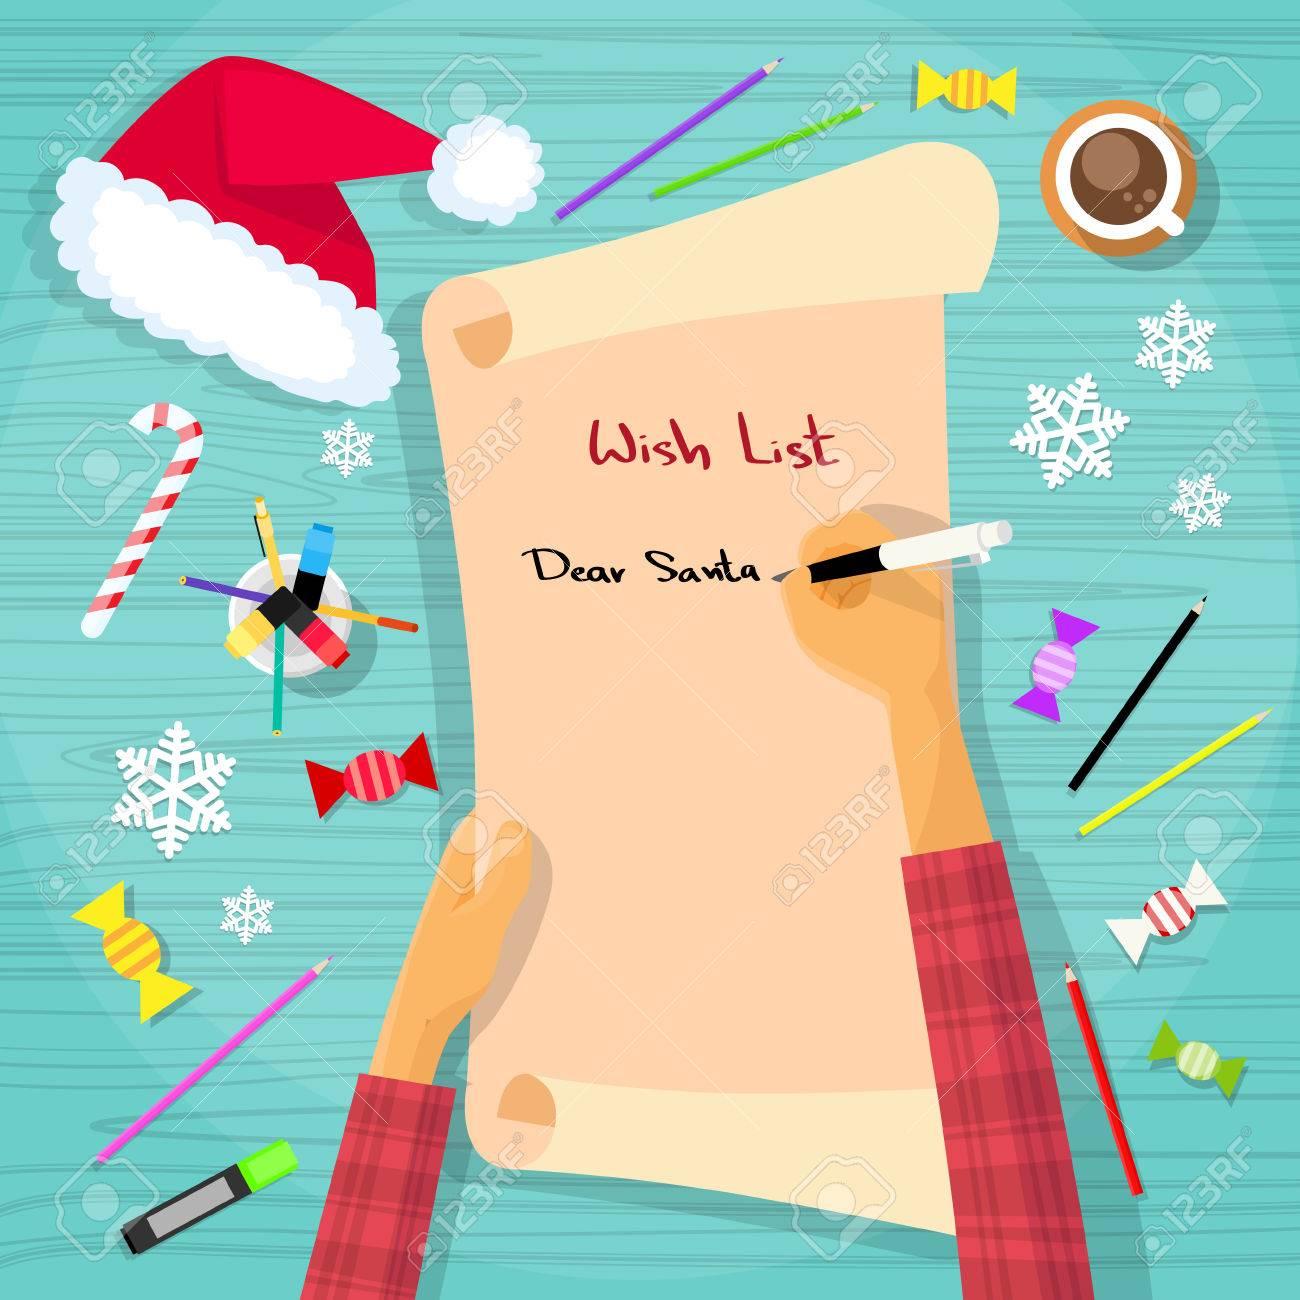 Merry Christmas Wish List To Santa Clause Child Hand Writing – Christmas Wish List Paper